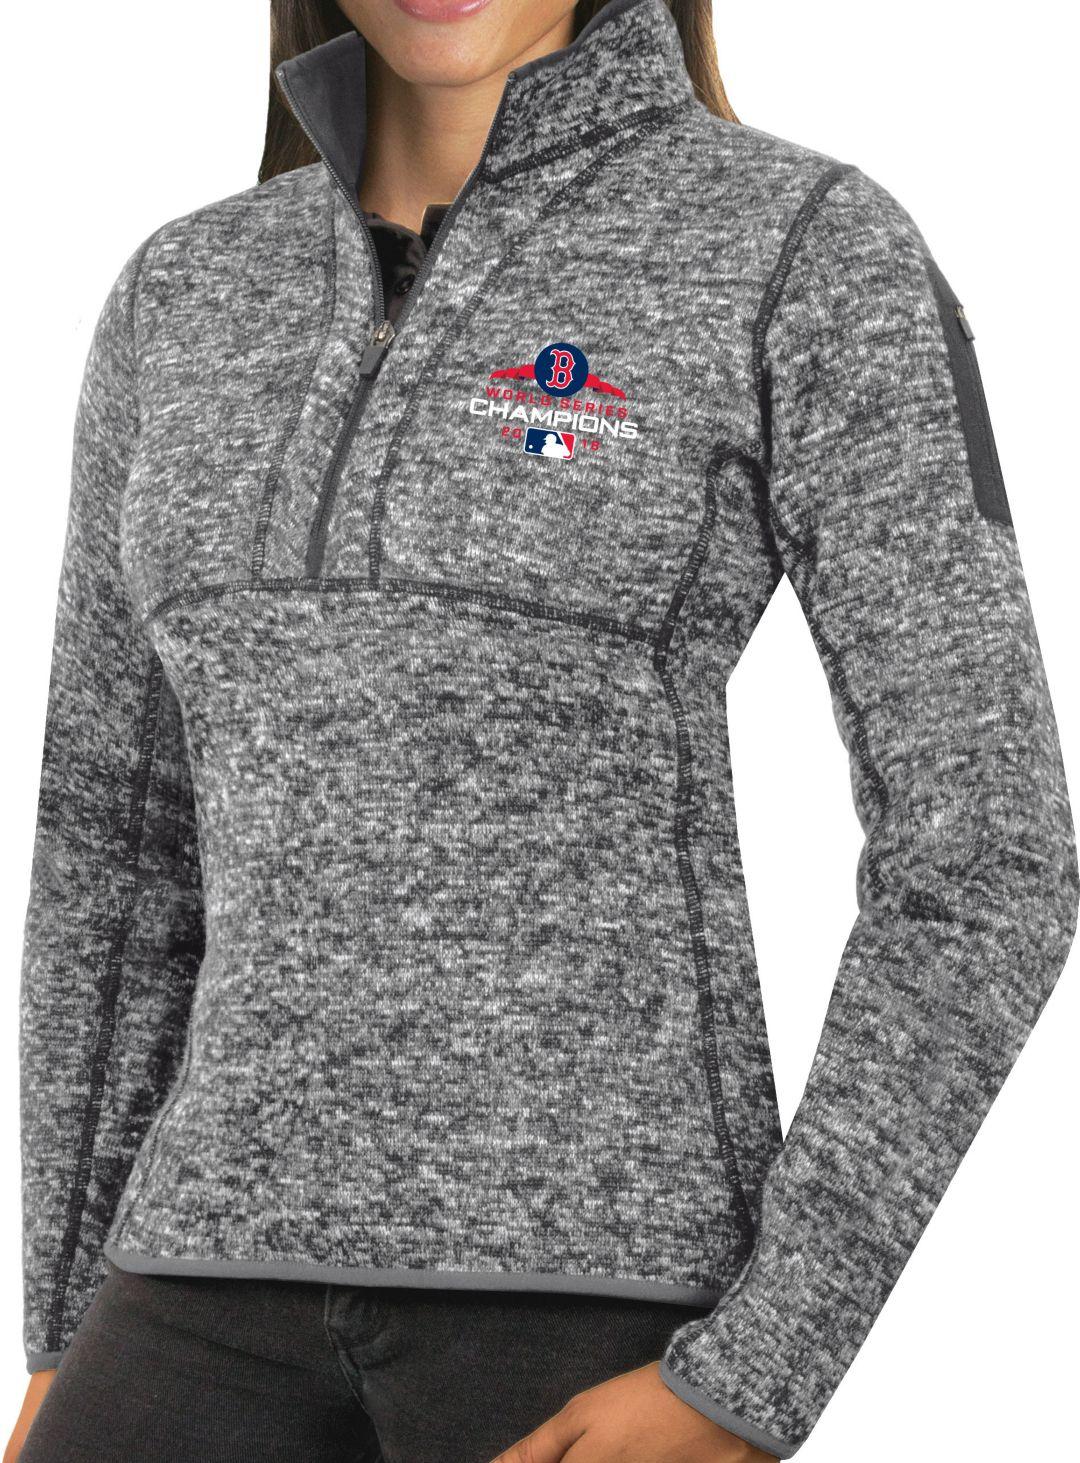 buy online ed52c 2edaf Antigua Women's 2018 World Series Champions Boston Red Sox Grey Fortune  Half-Zip Pullover